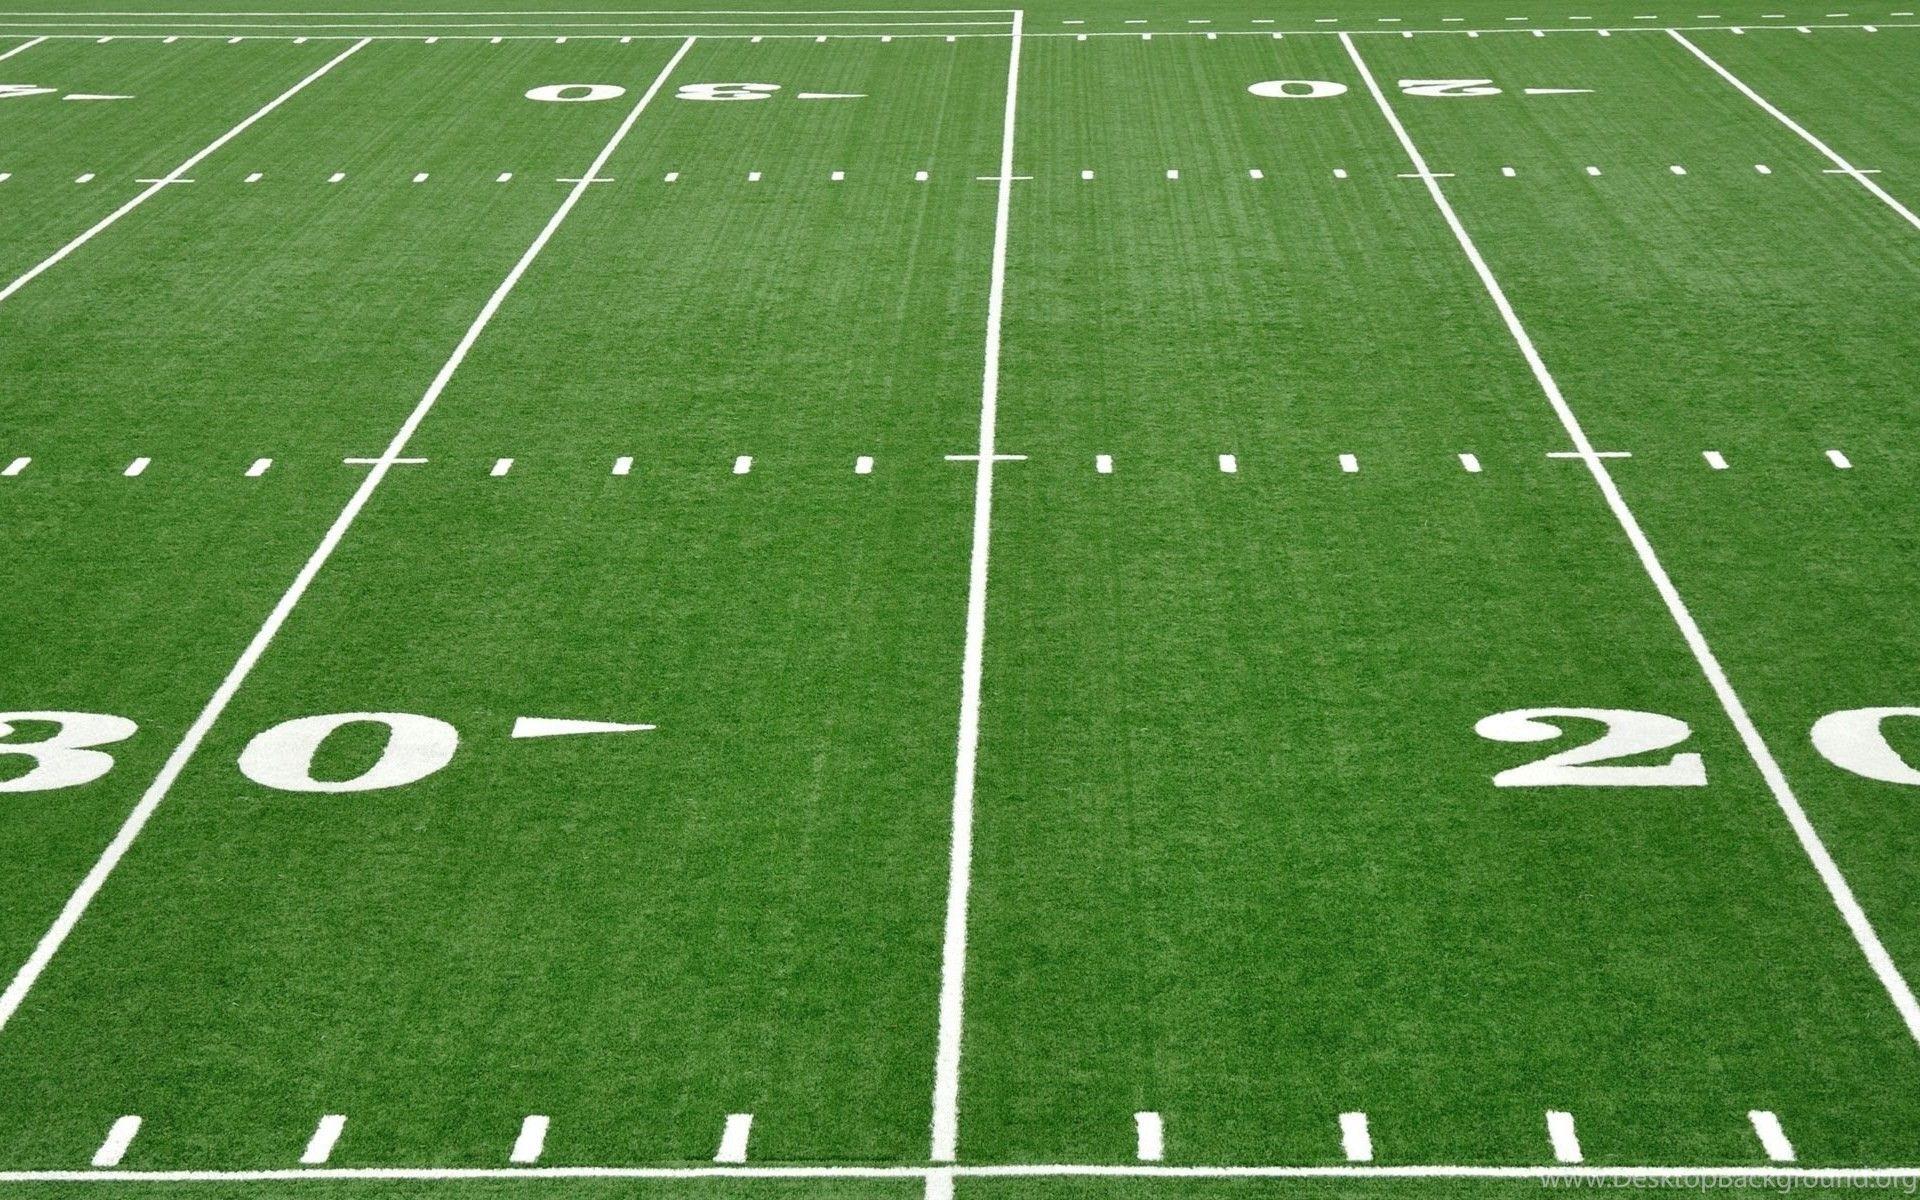 football field wallpapers on wallpaperdog football field wallpapers on wallpaperdog